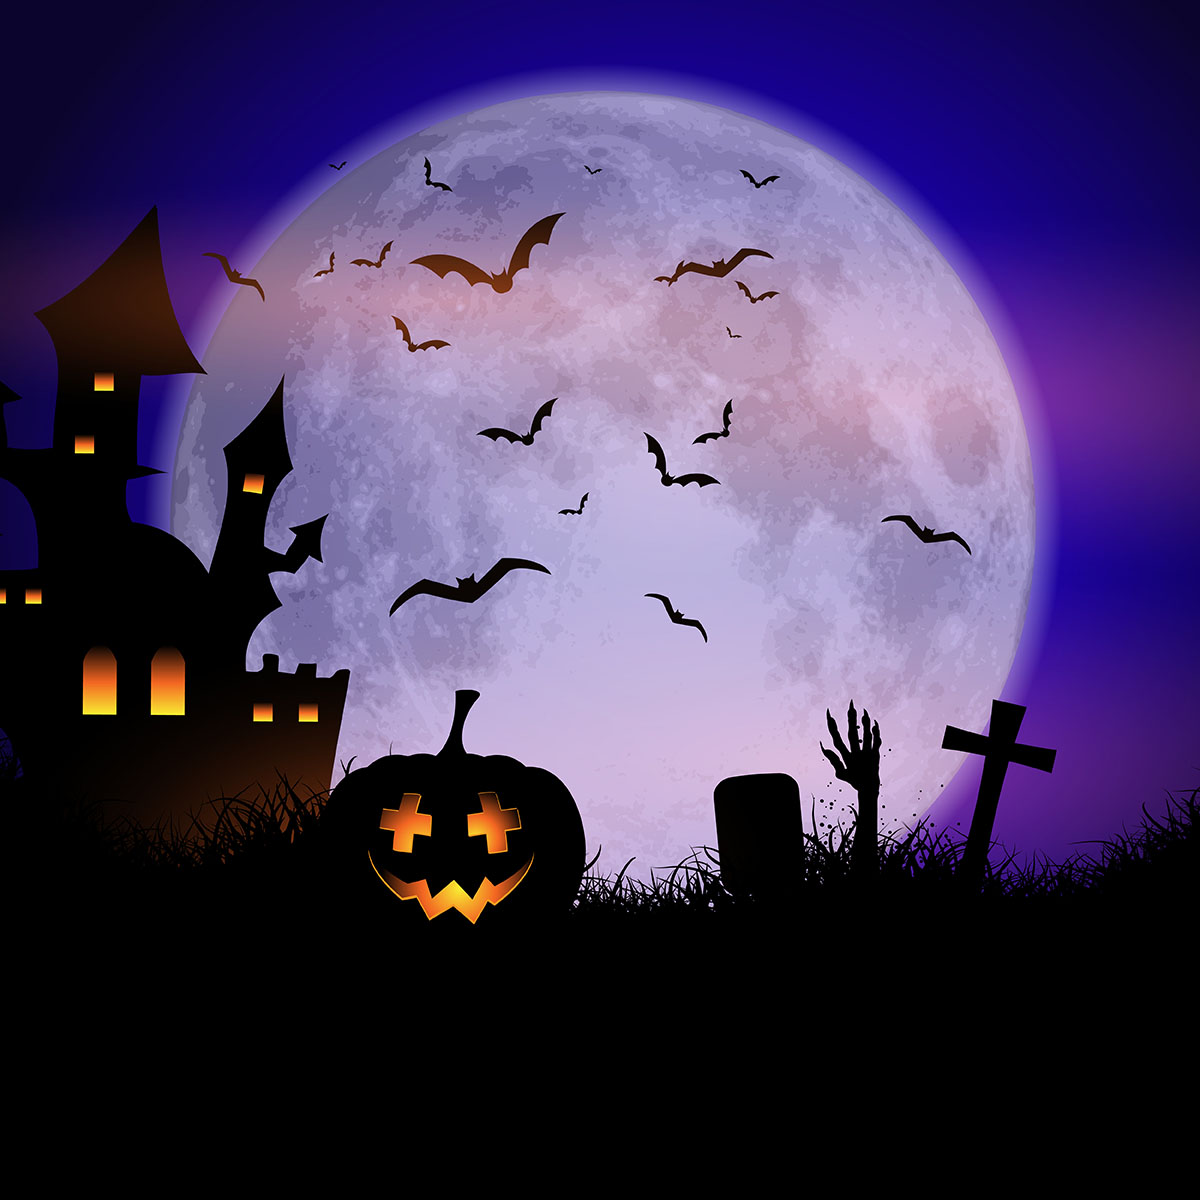 Fall Graveyard Cemetery Wallpaper Spooky Halloween Background Download Free Vector Art